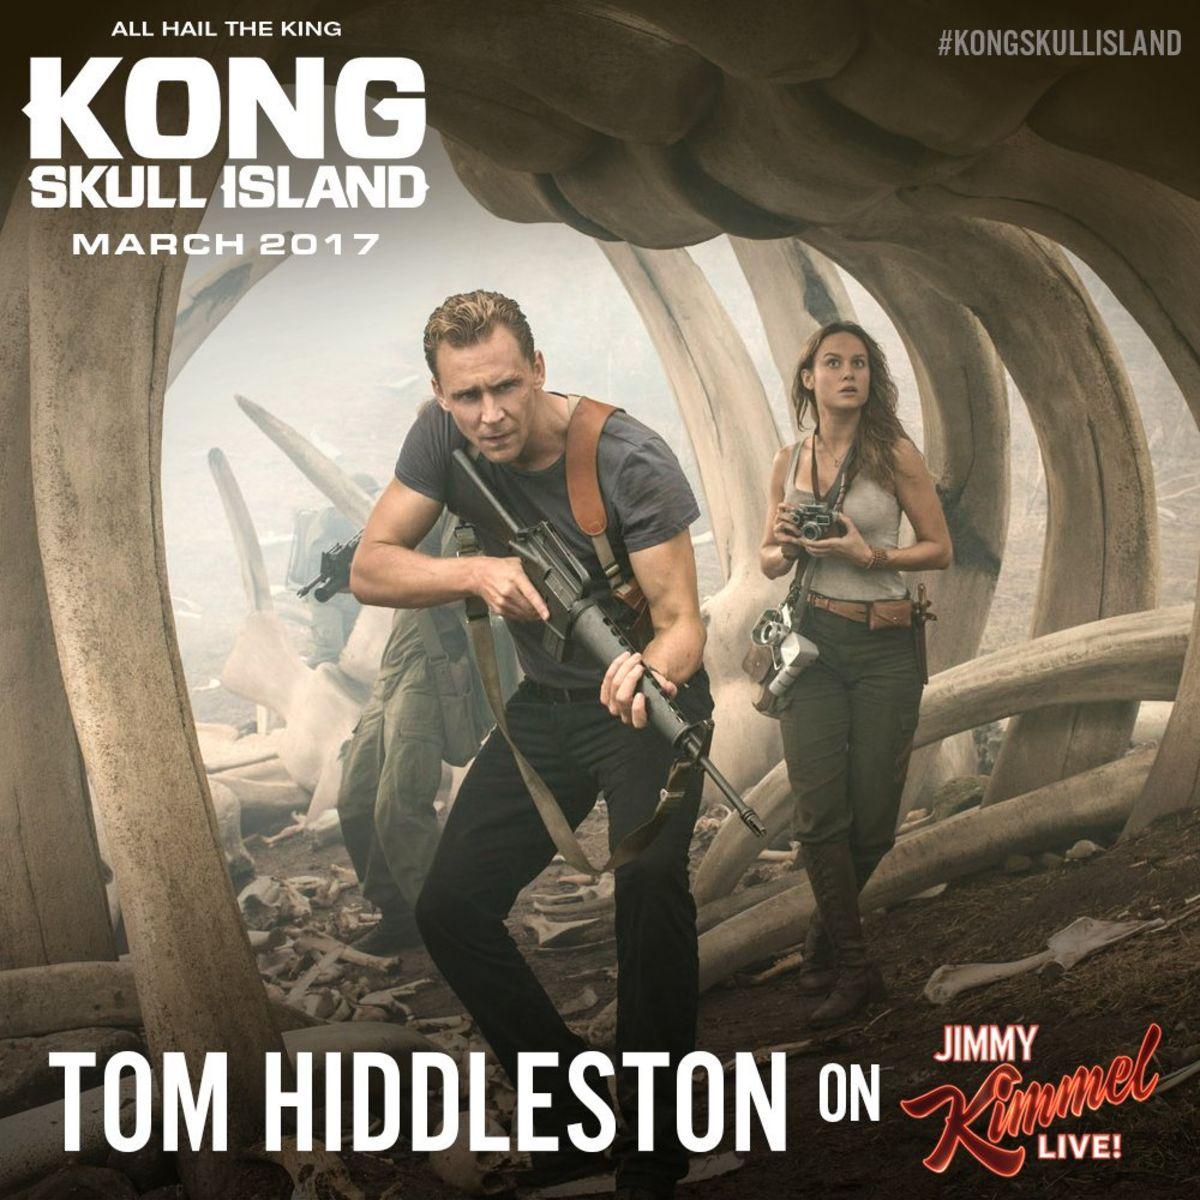 Kong-Skull-Island-Jimmy-Kimmel-Live-promo-pic.jpg